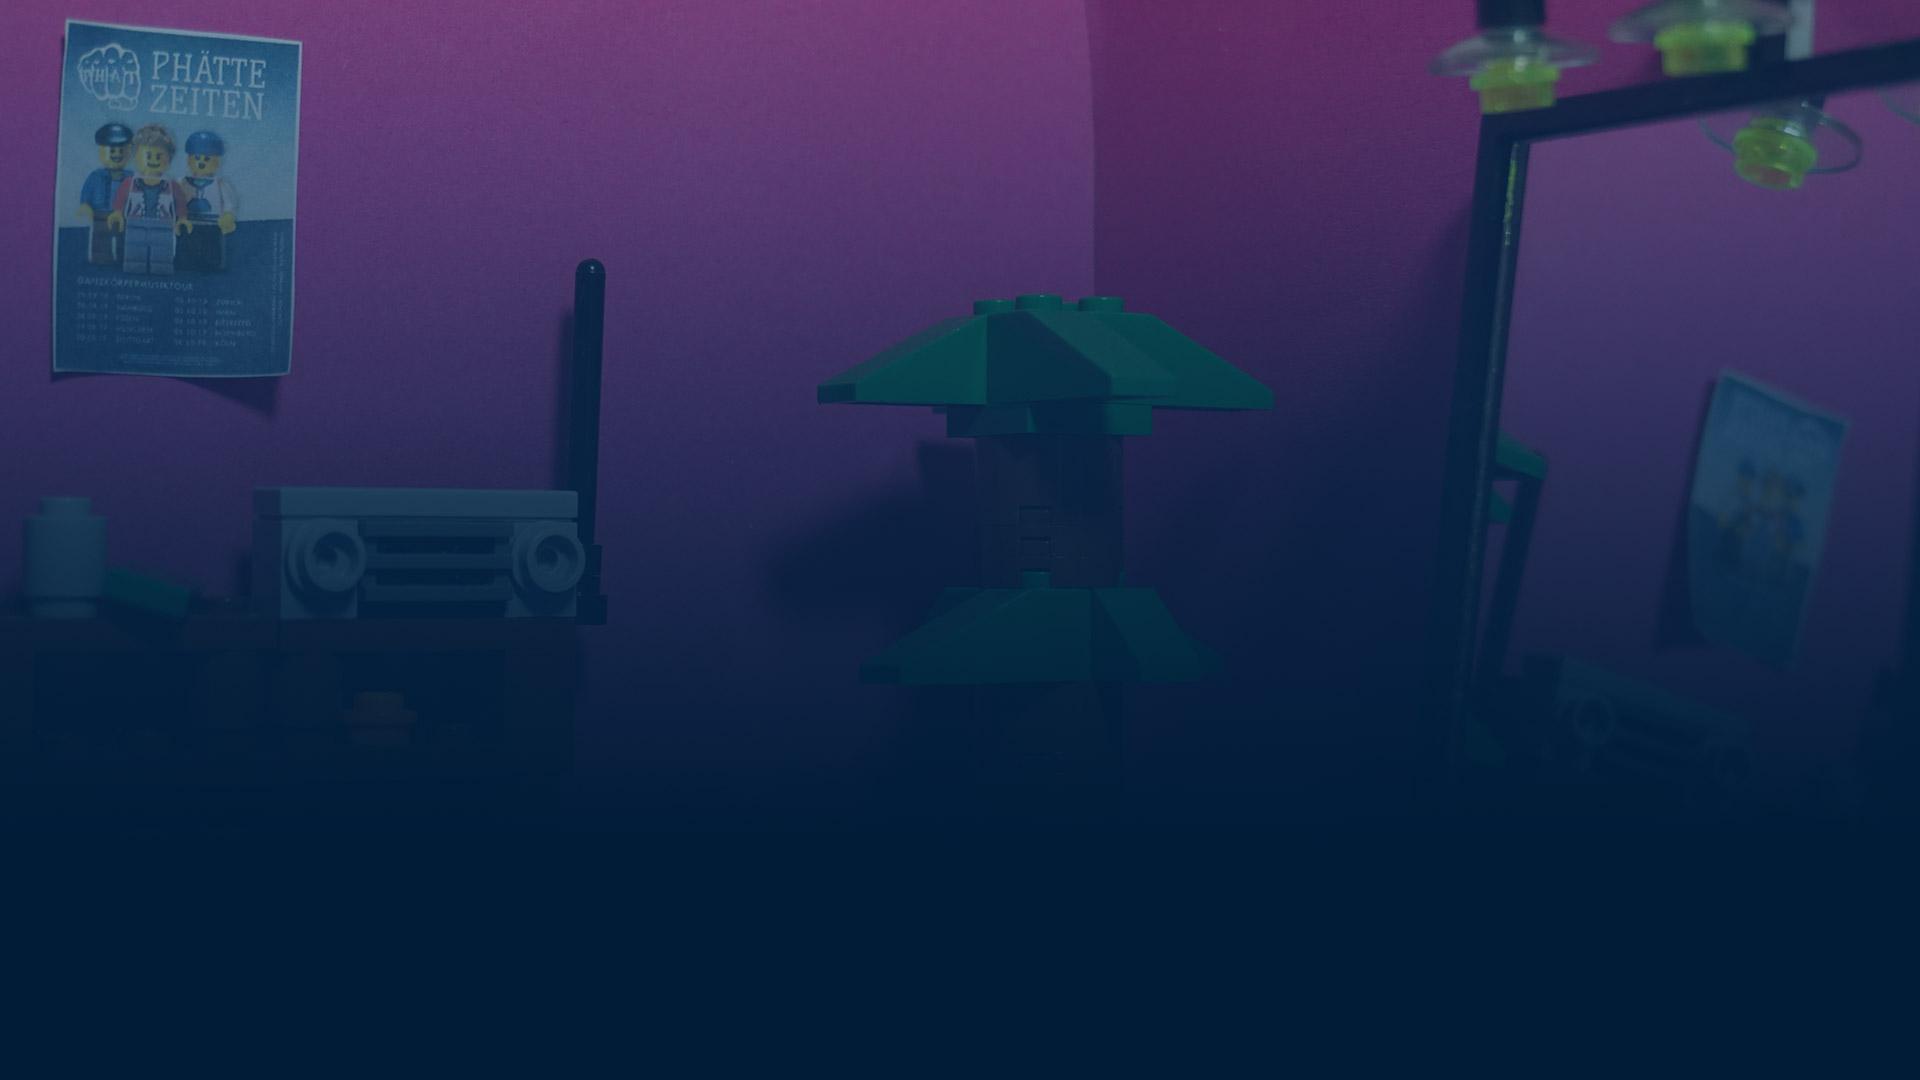 LEGGO Background